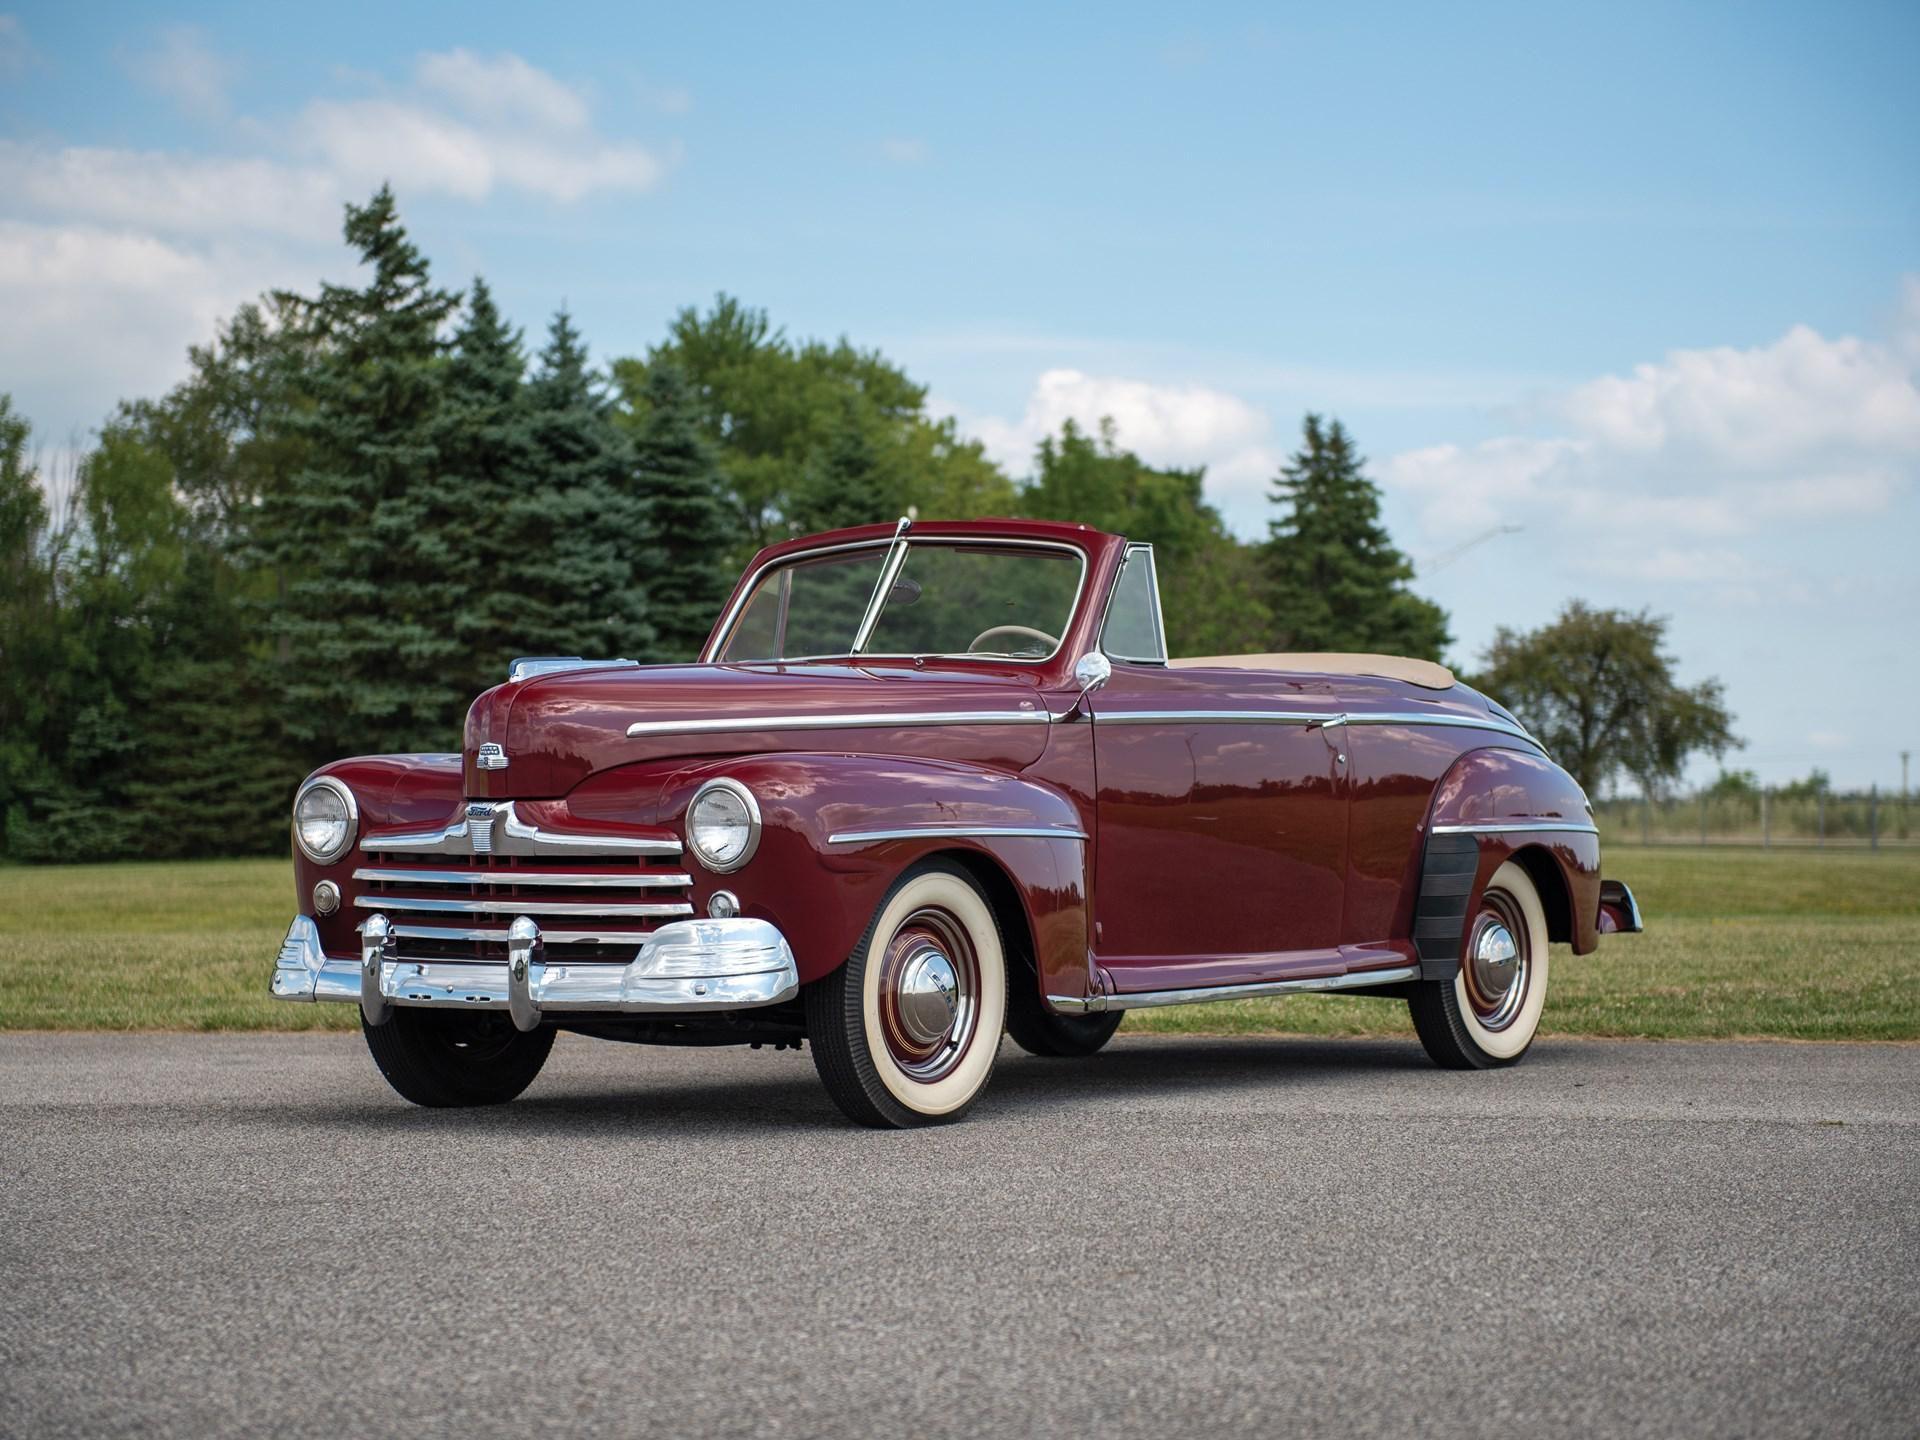 1947 Ford Super Deluxe Convertible Vin 044h4814 Classic Com